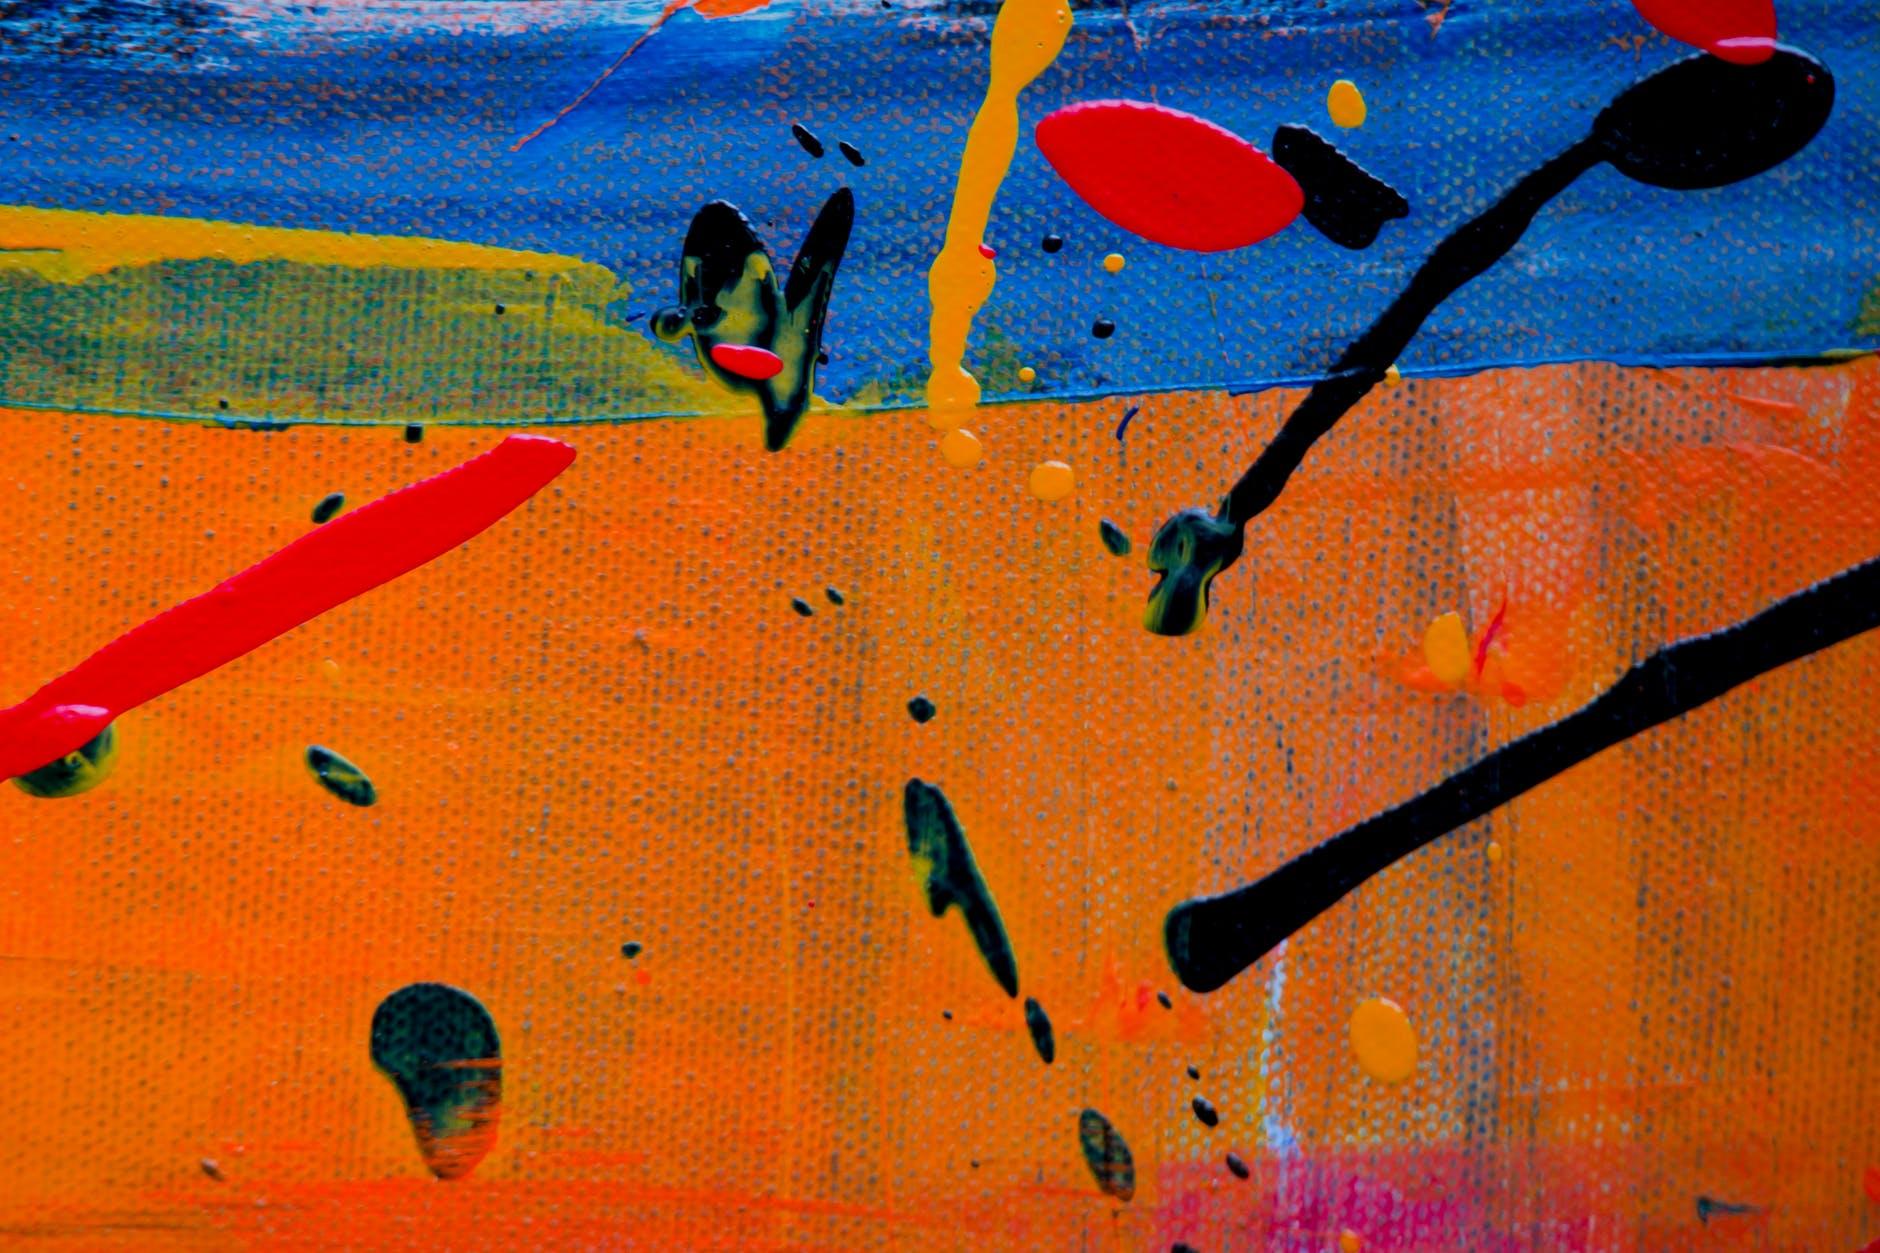 An abstract art piece made using paint